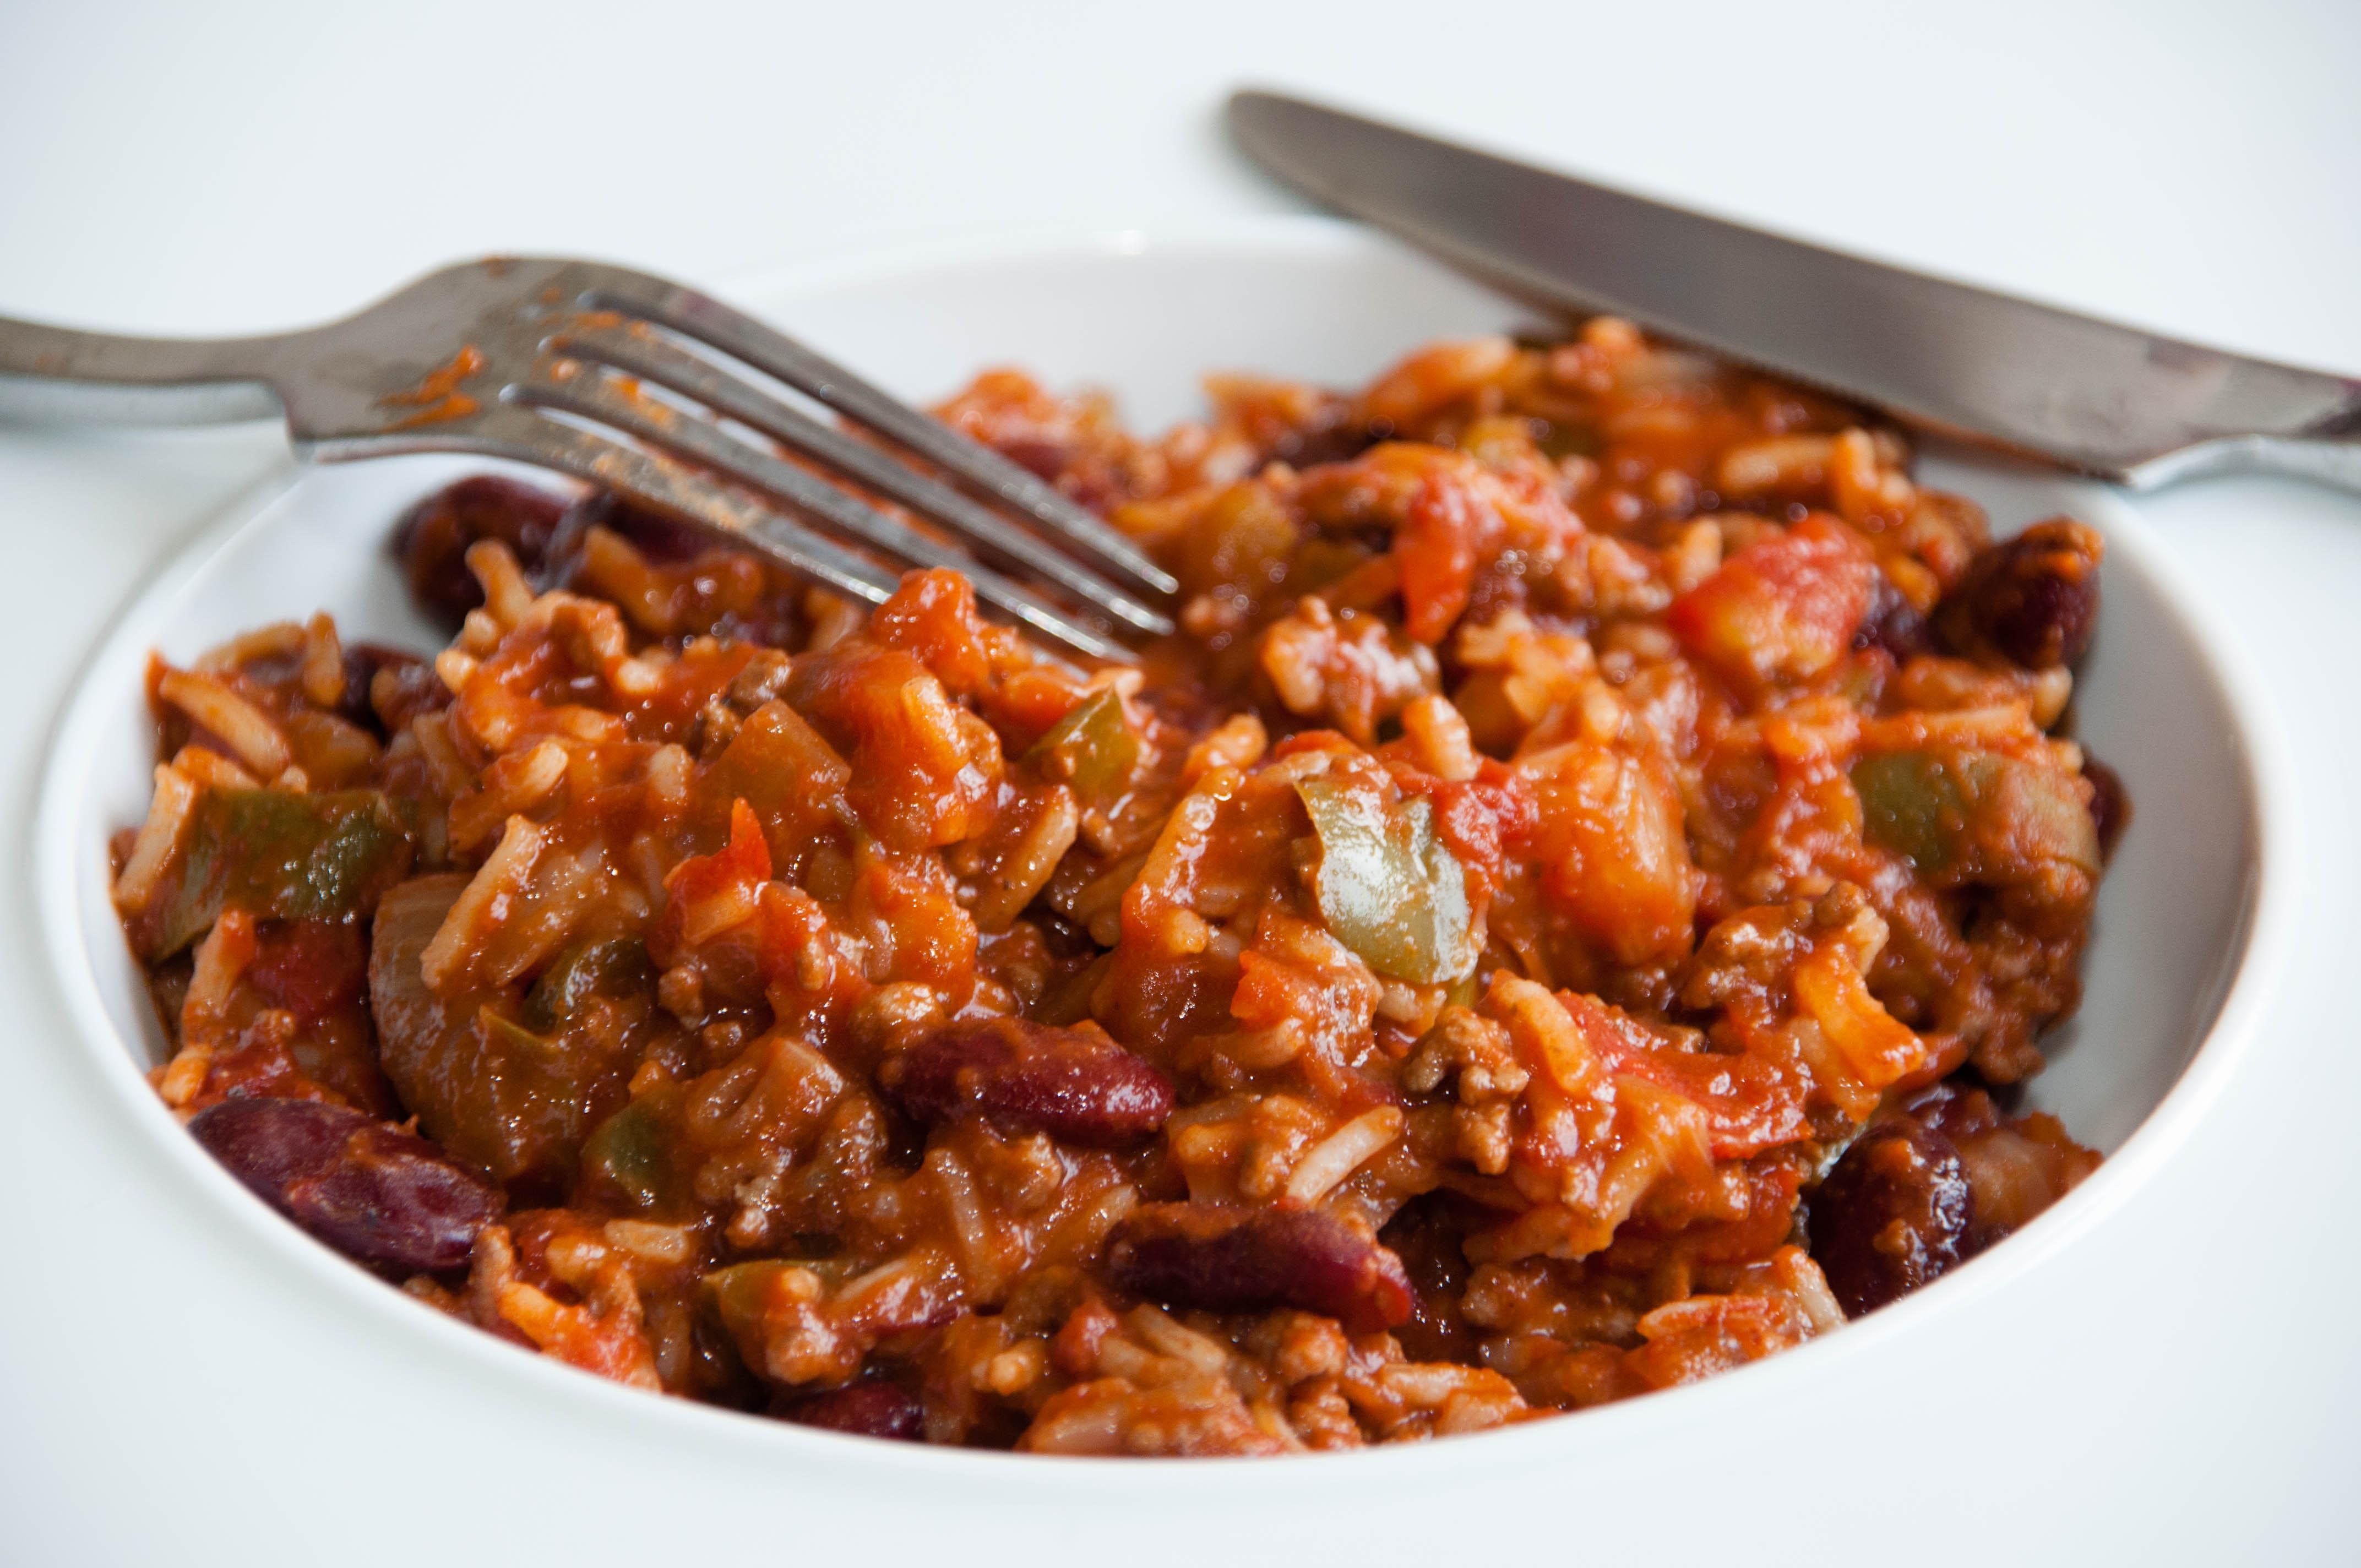 Chili con carne | Les petits plats de Gwendoline